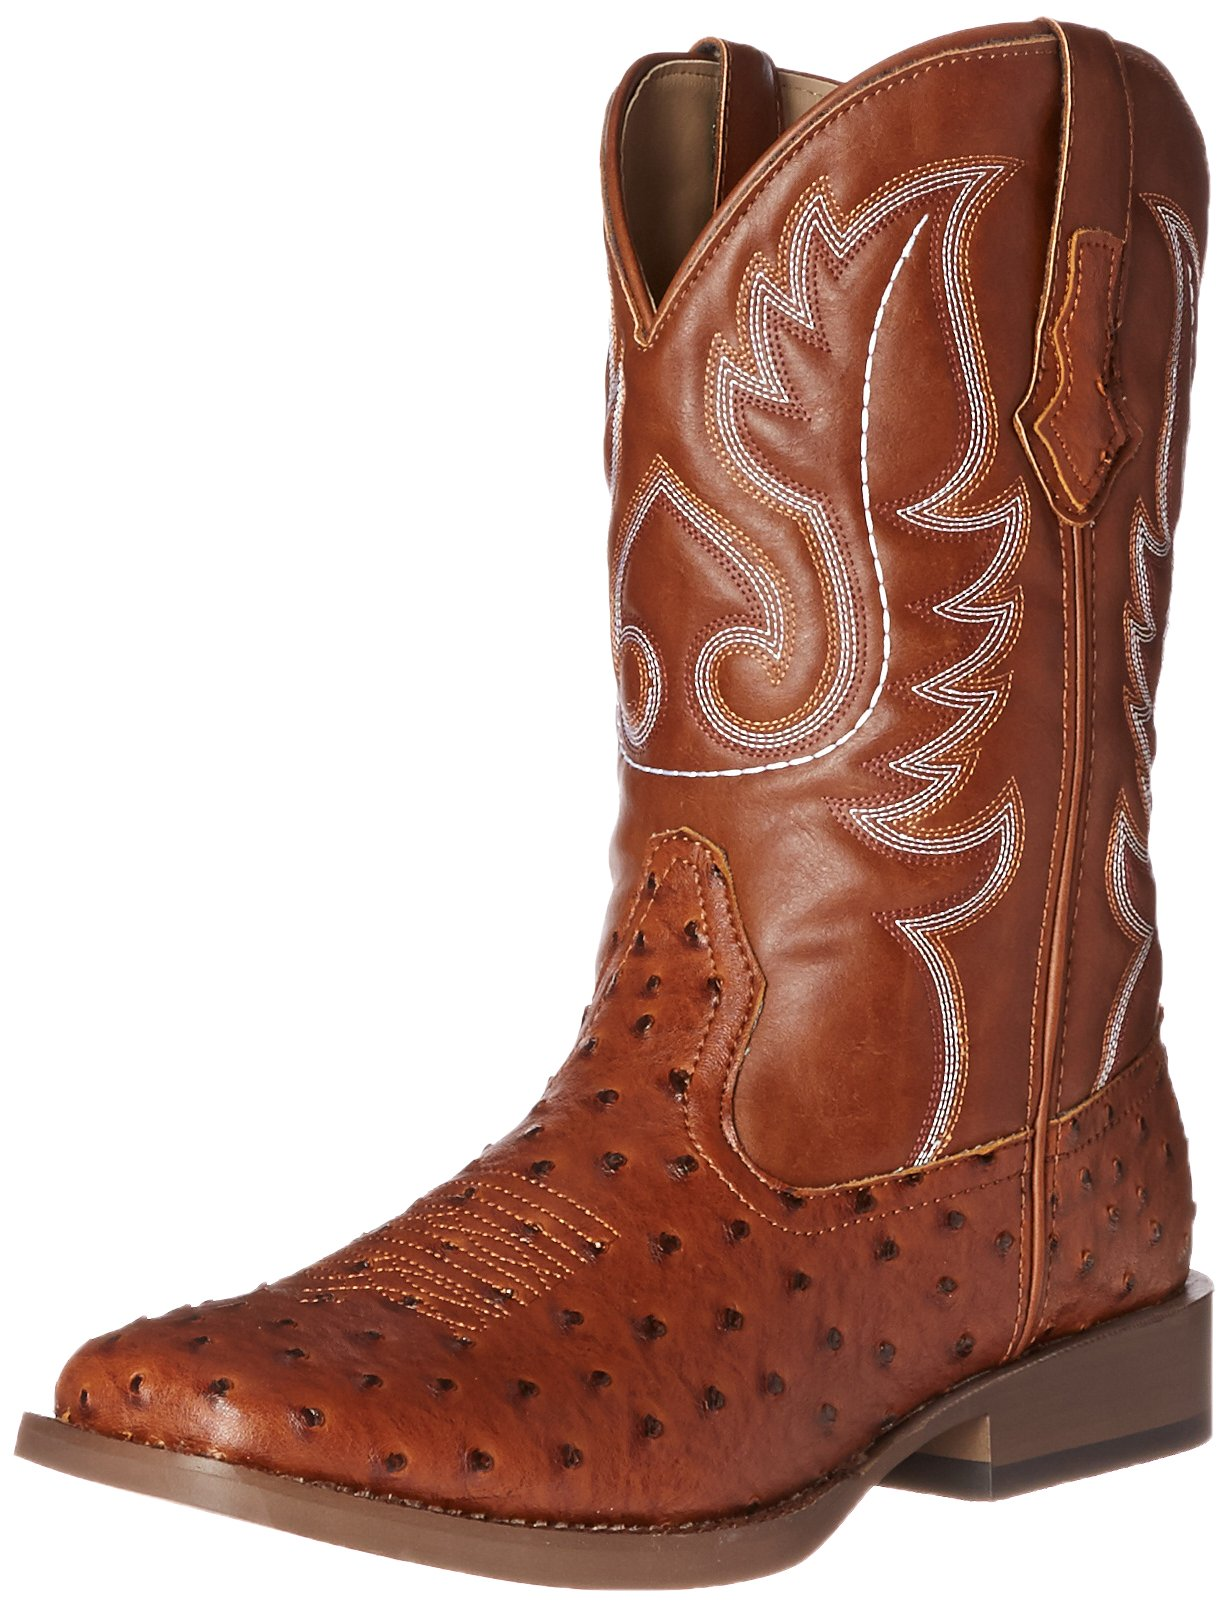 Roper Men's Basic Square Toe Western Boot, Tan, 12 M US